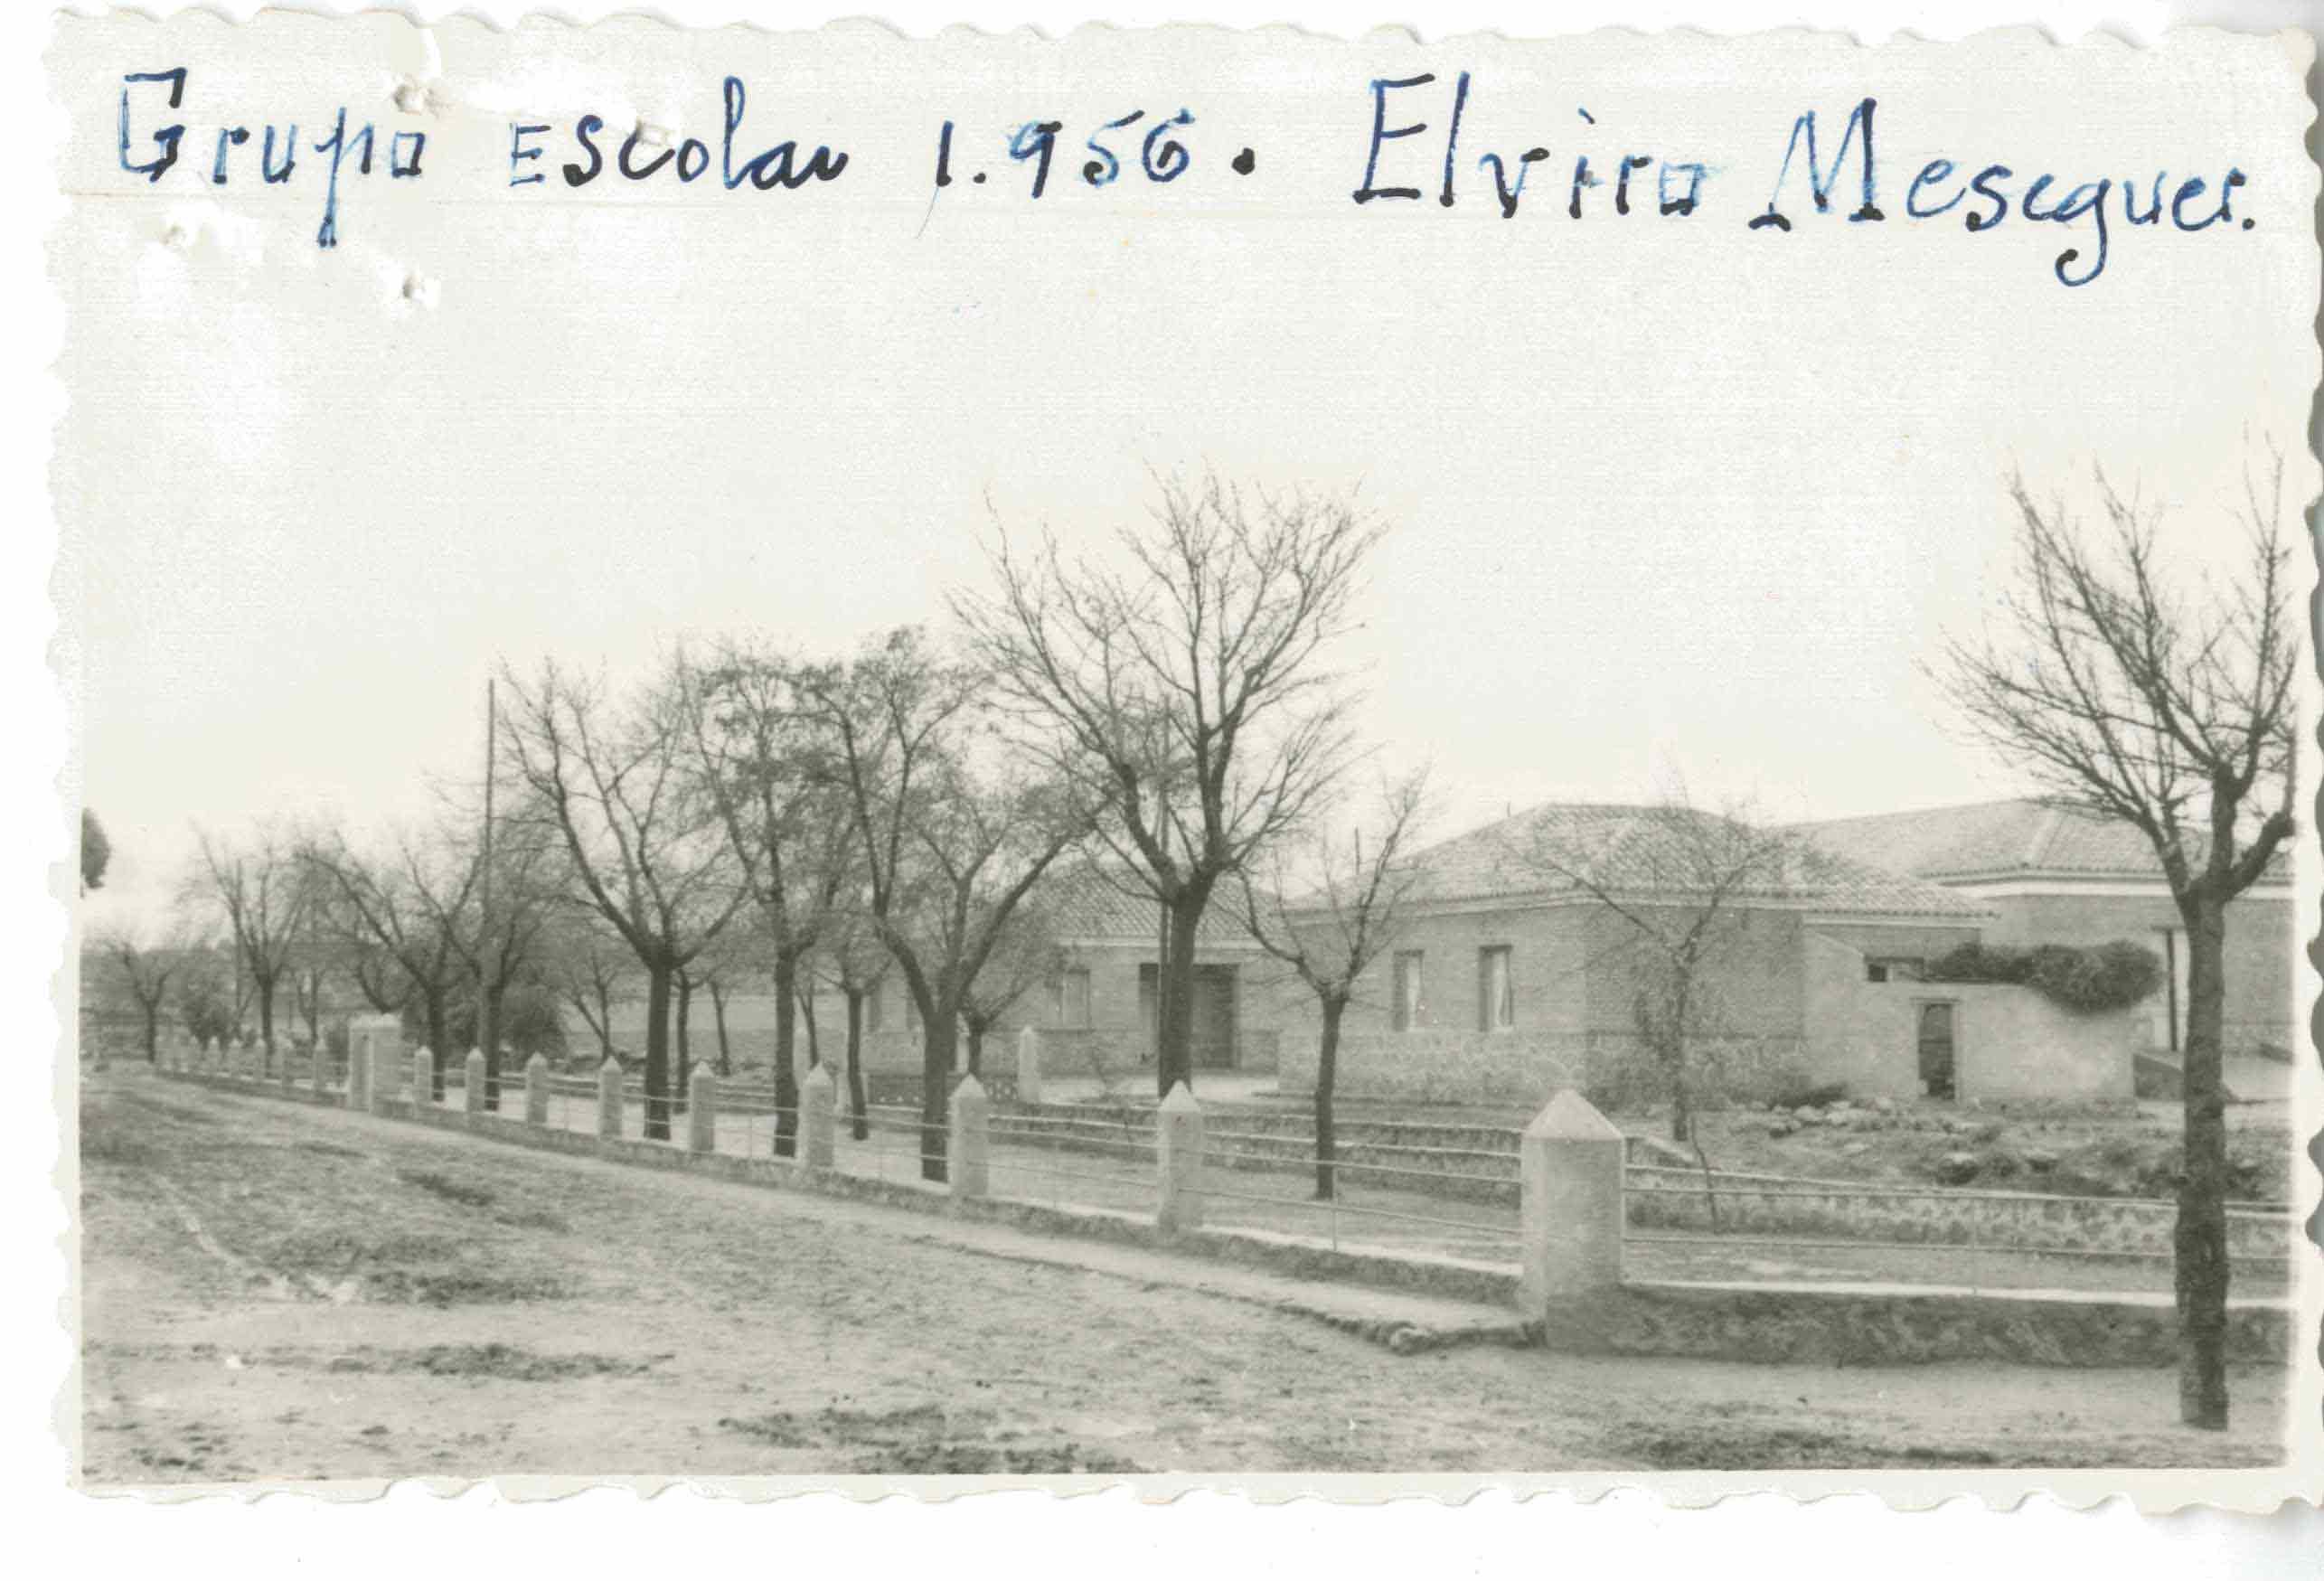 Santa Ana de Pusa. Escuelas Elviro Meseguer. 1956 (P-800)